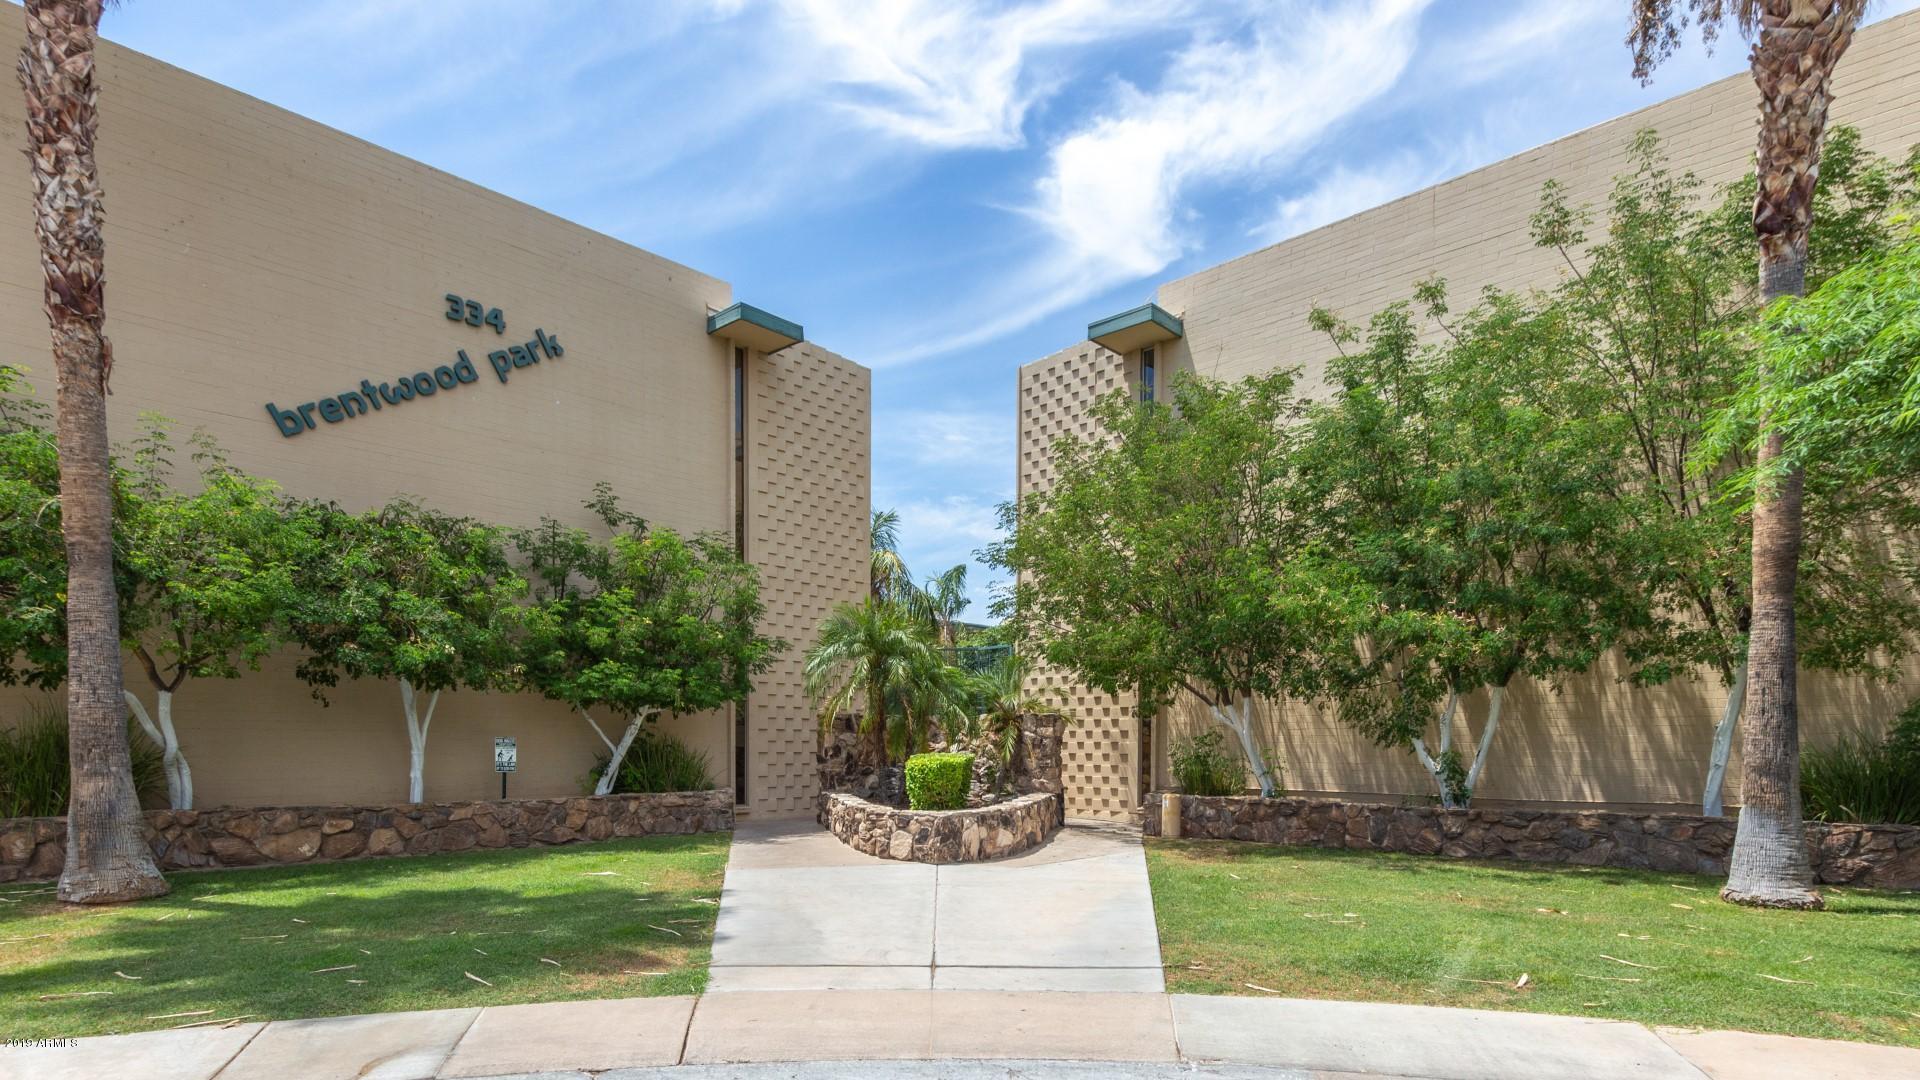 Photo of 334 W MEDLOCK Drive #C203, Phoenix, AZ 85013